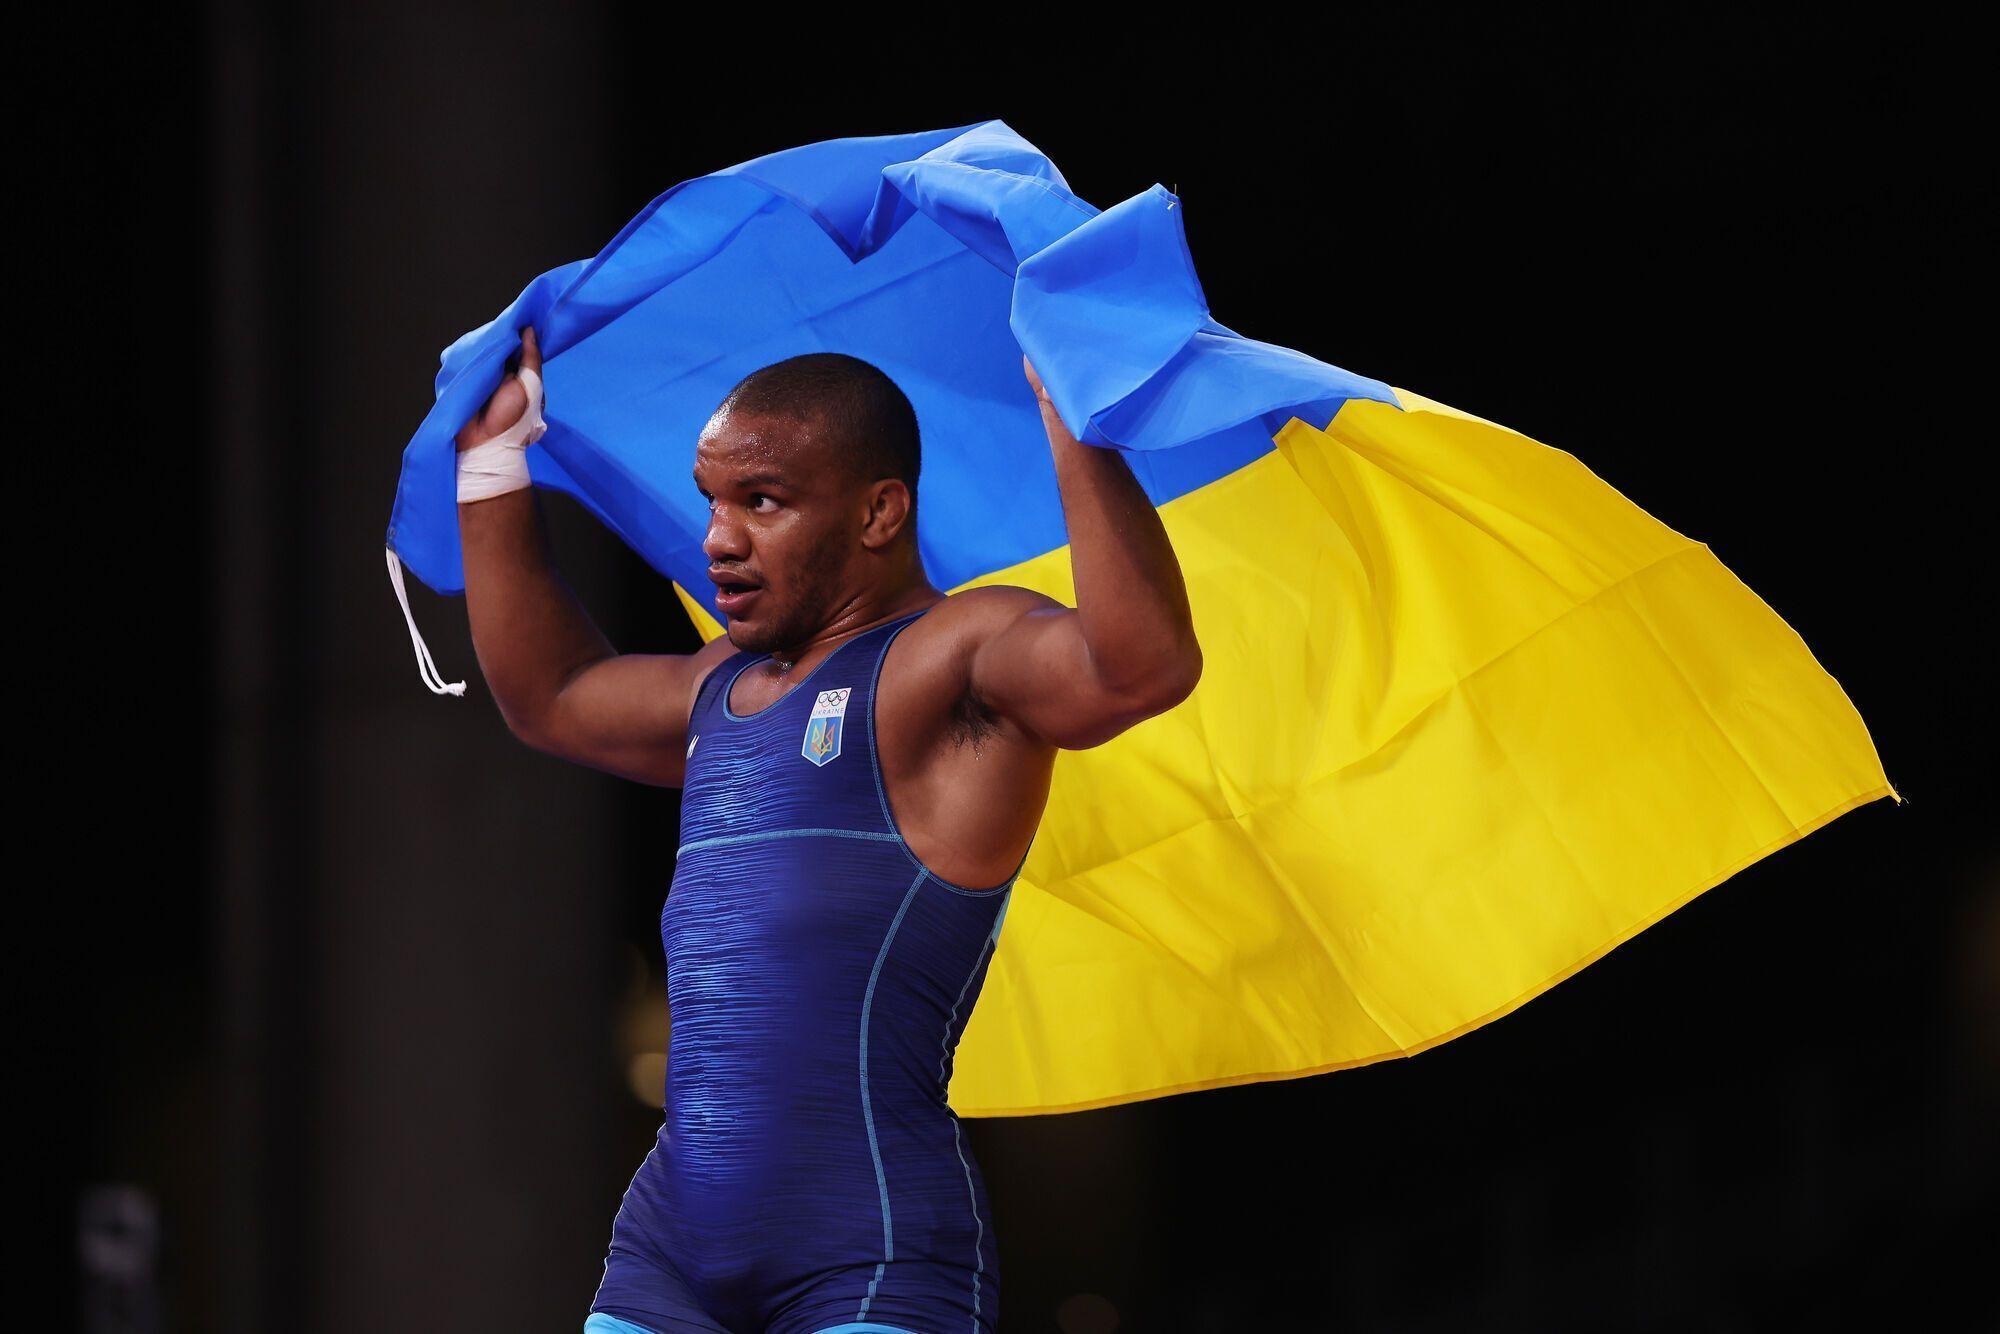 Жан Беленюк с флагом Украины